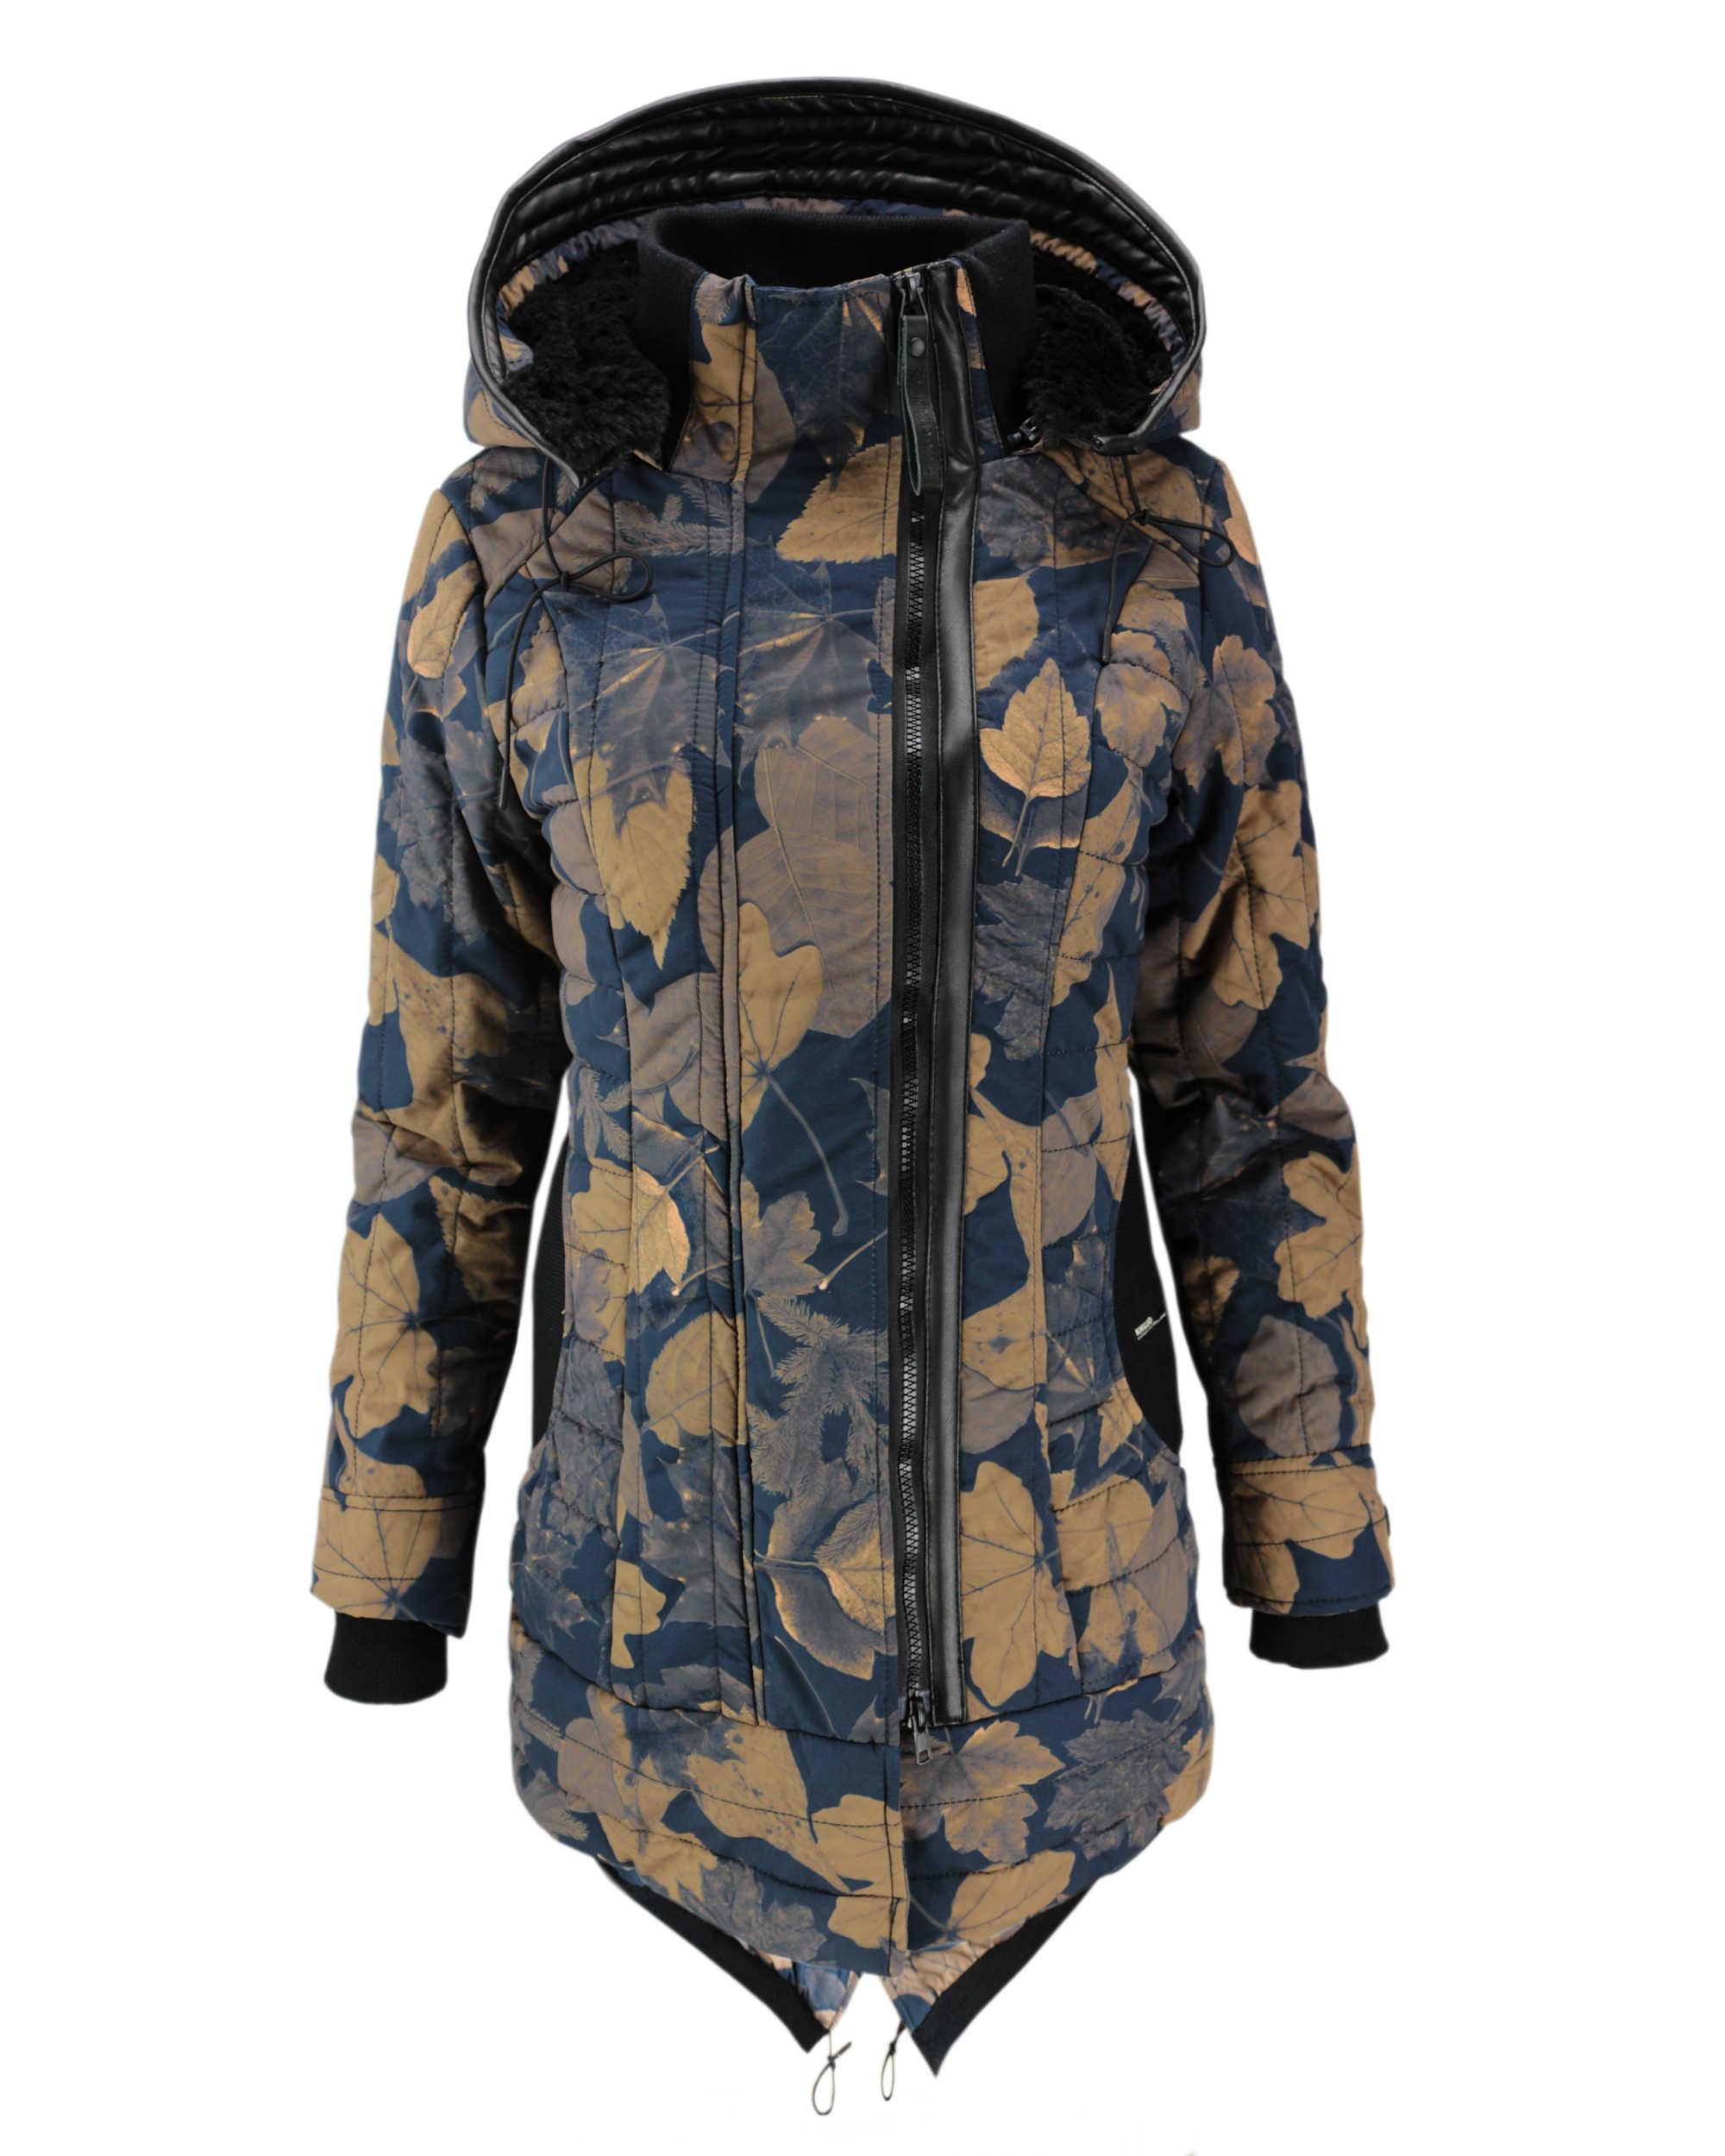 official photos 5d5a2 dd031 KHUJO Damen Winterjacke Jacke Mantel CAYUS Winter Parka Kapuze  Allover-Print Blätter